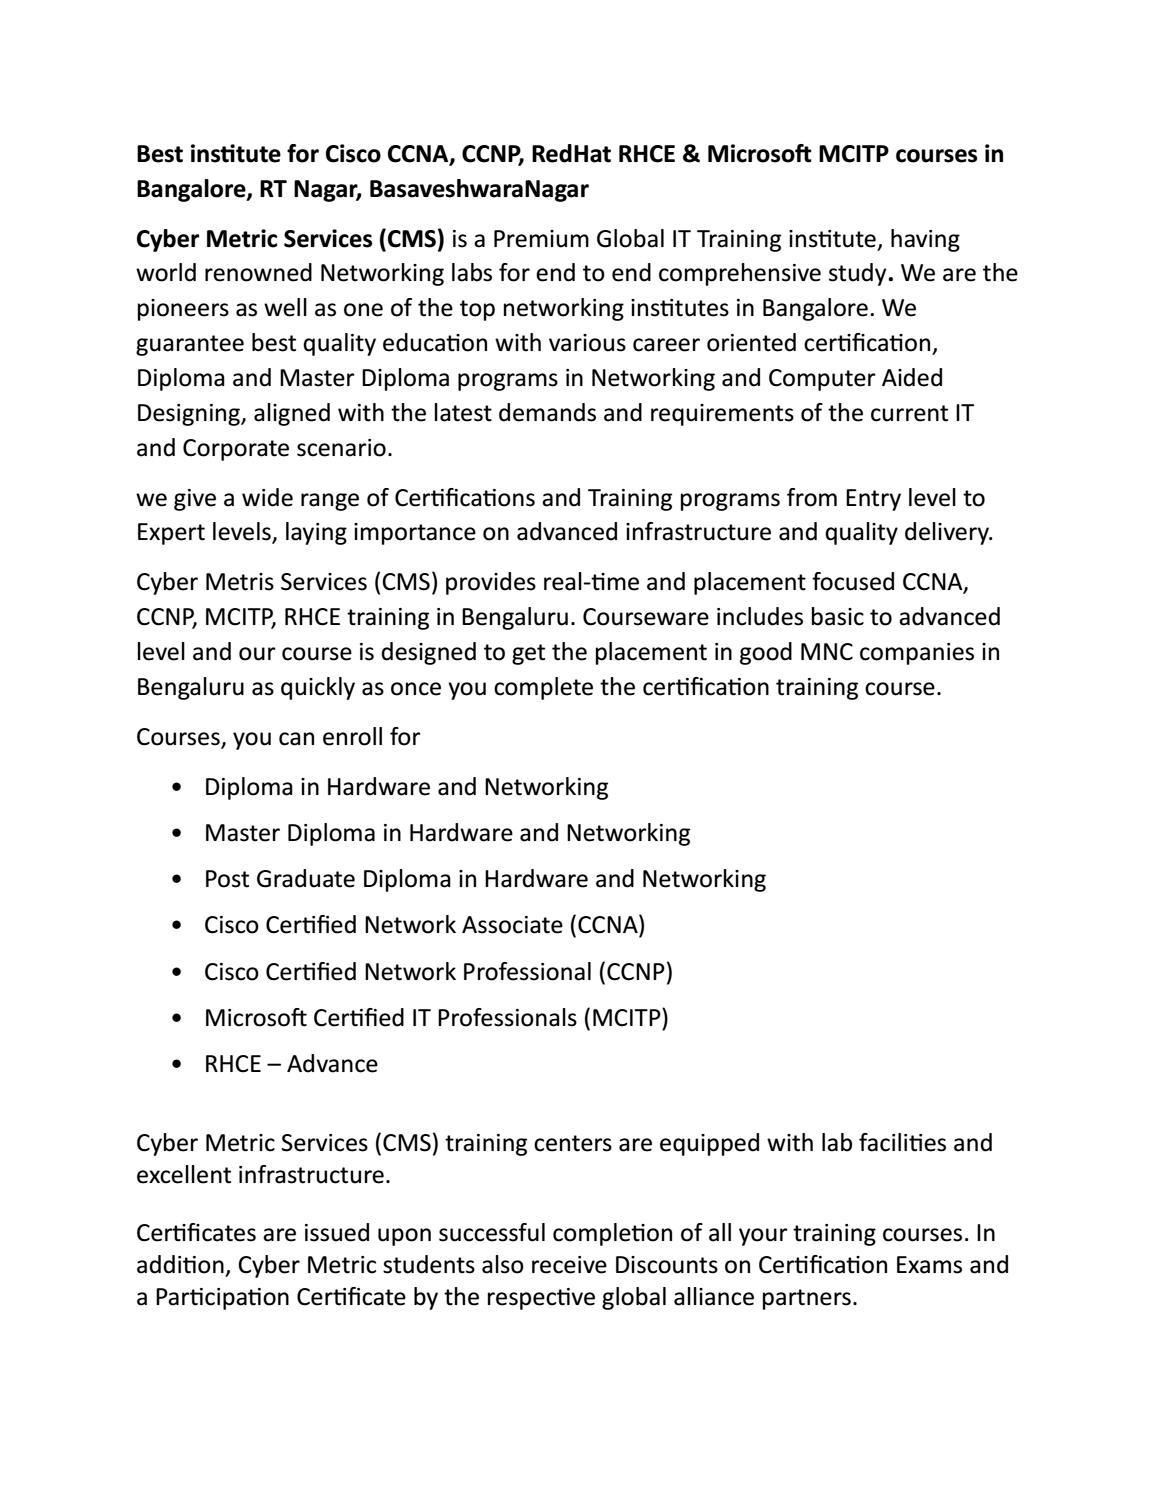 Best Institute For Cisco Ccna Ccnp Redhat Rhce Microsoft Mcitp